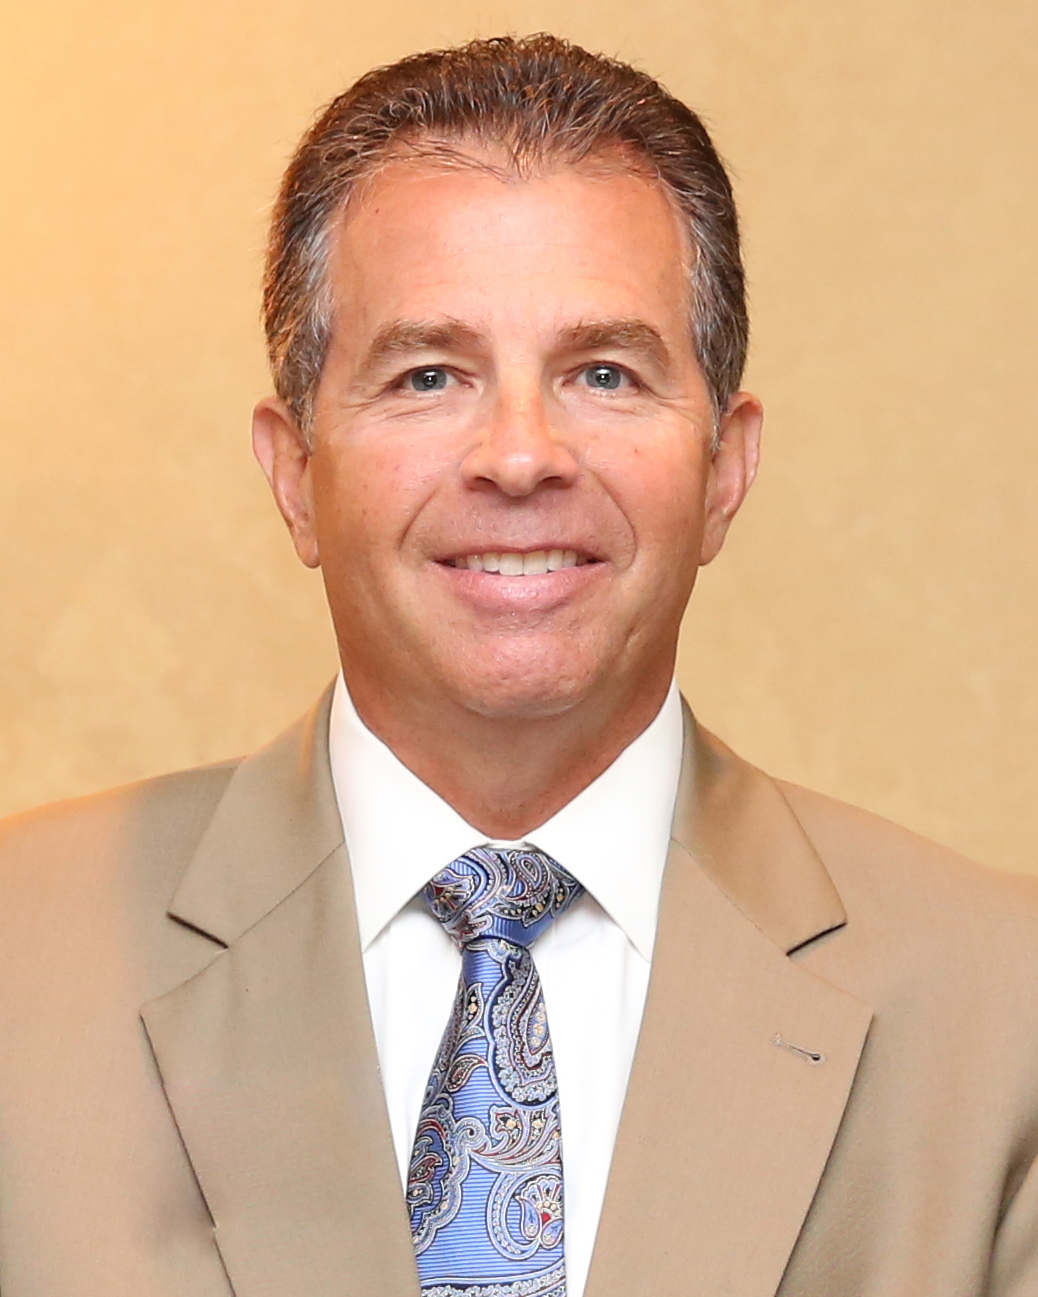 L. Steven Dempsey : Associate Vice President